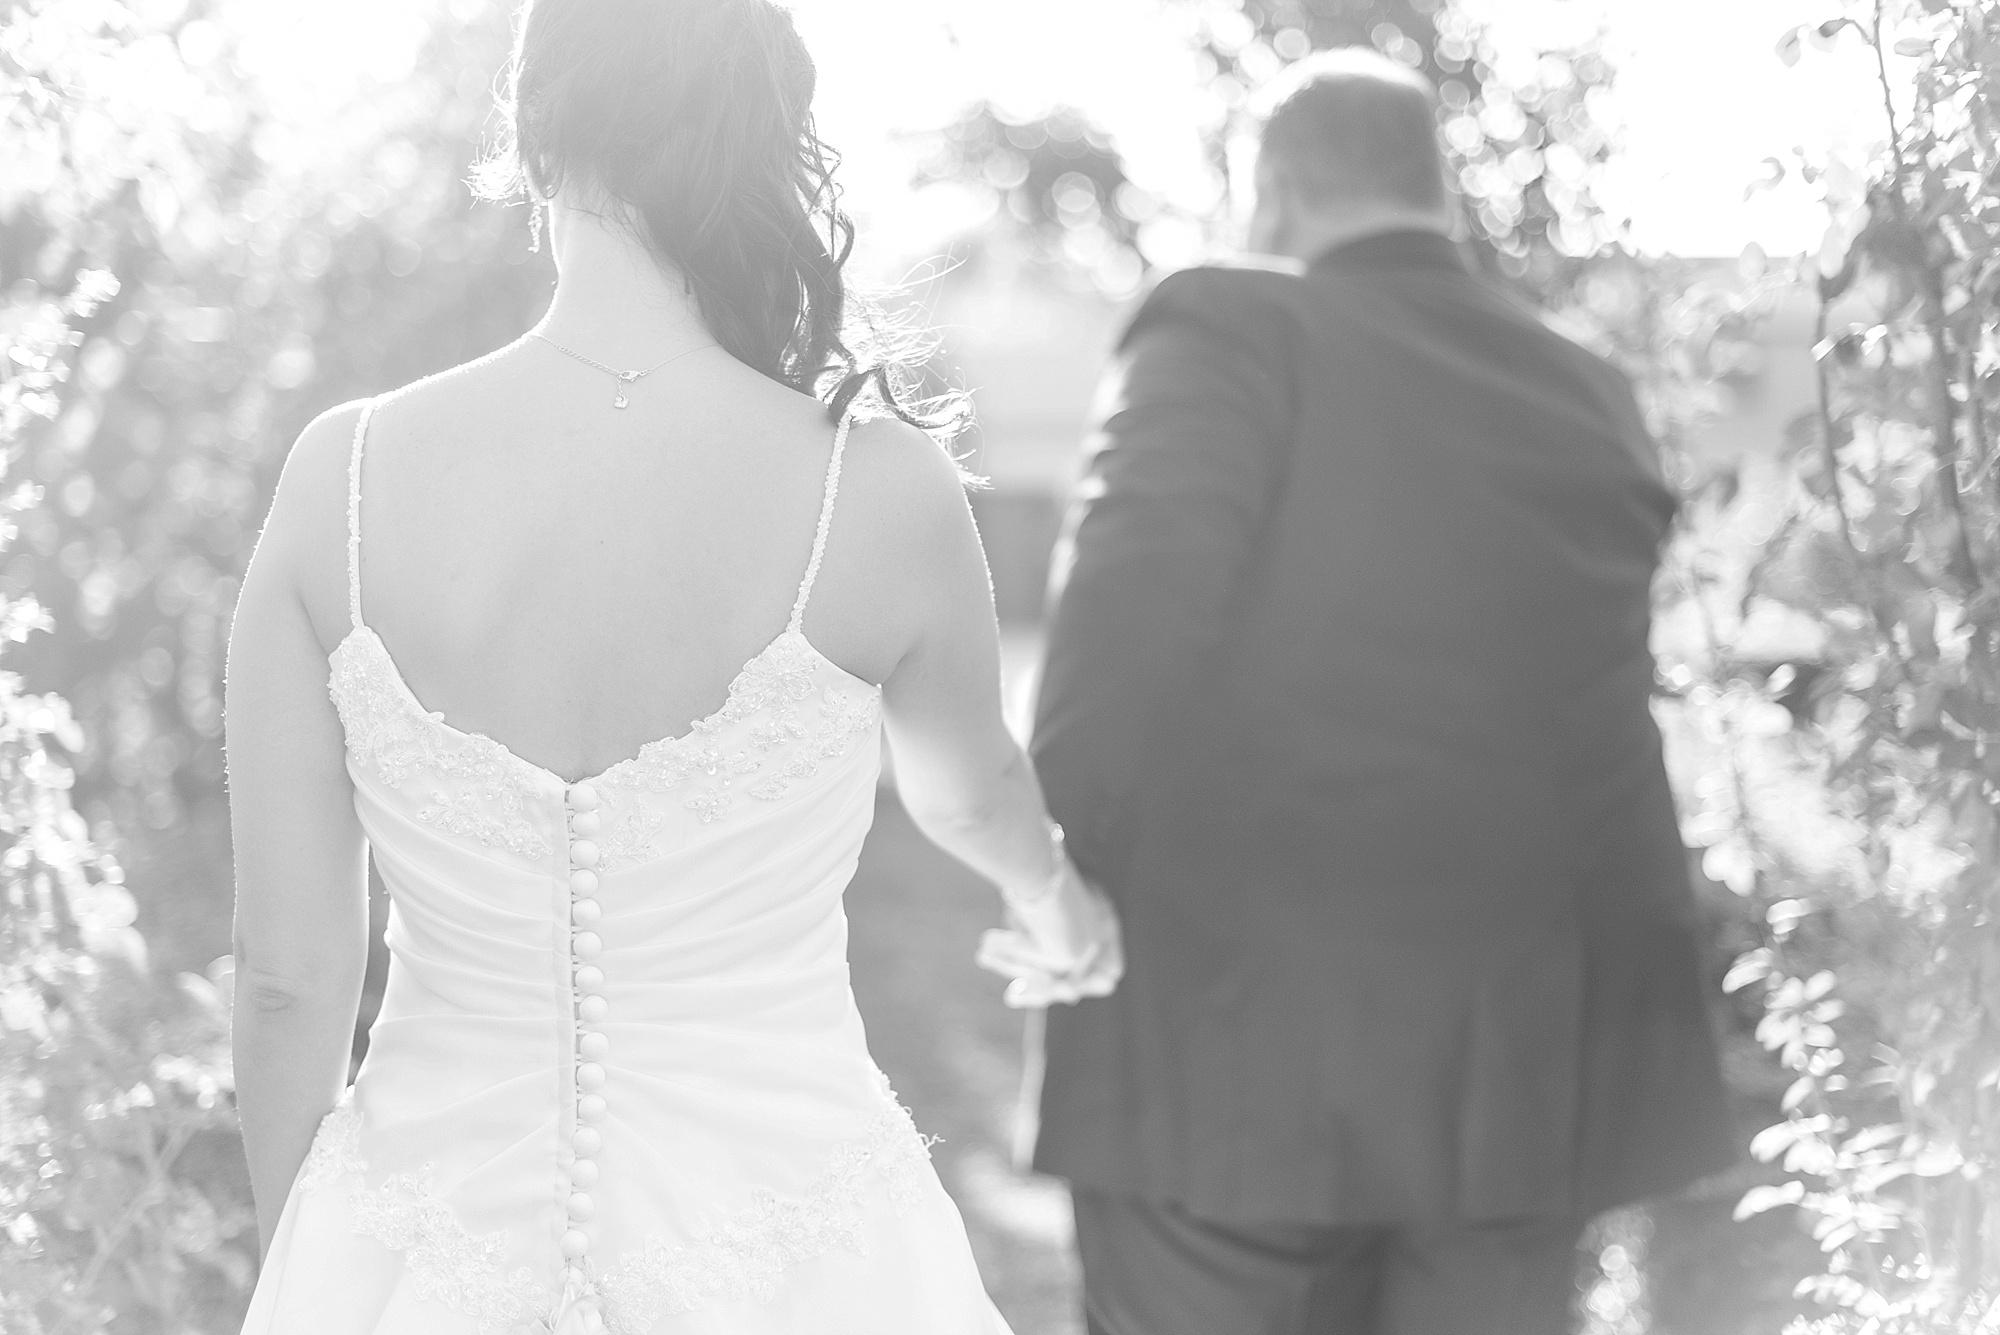 Darren-Bester-Cape-Town-Wedding-Photographer-The-Royal-Portfolio-La-Residence-Franschhoek-Shirley-and-Andre_0125.jpg